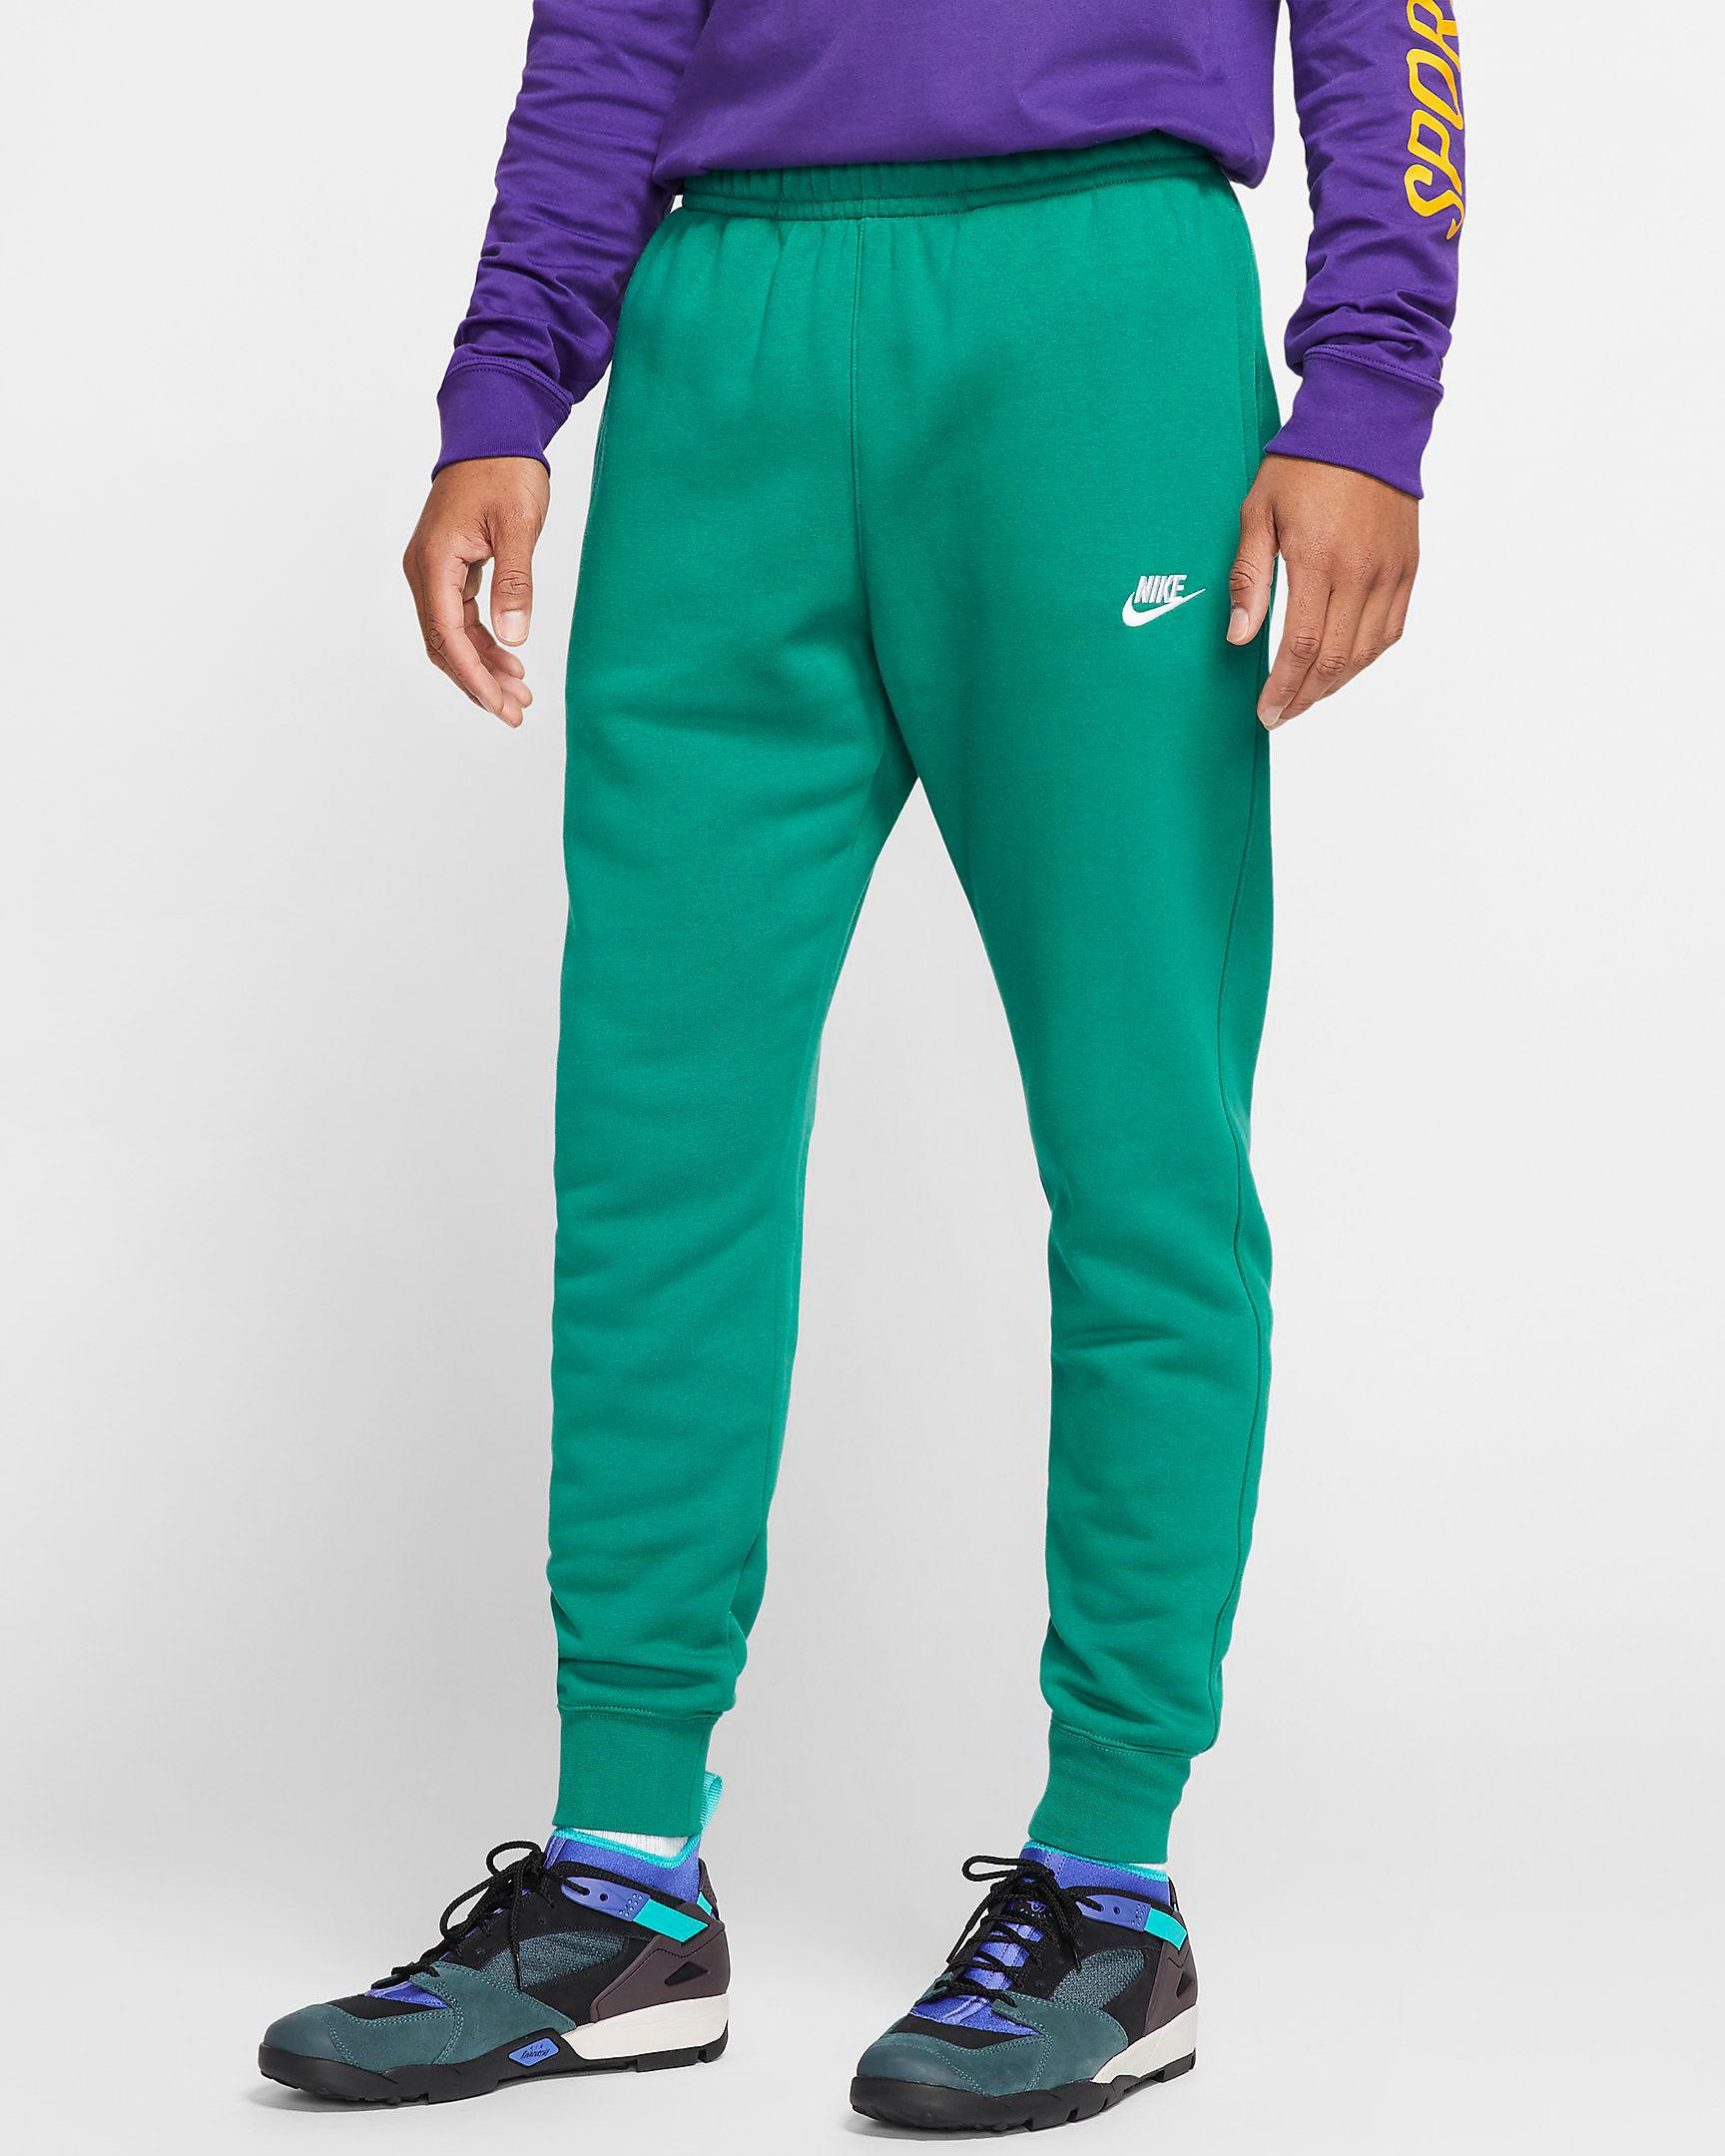 nike-island-green-just-do-it-fleece-joggers-1